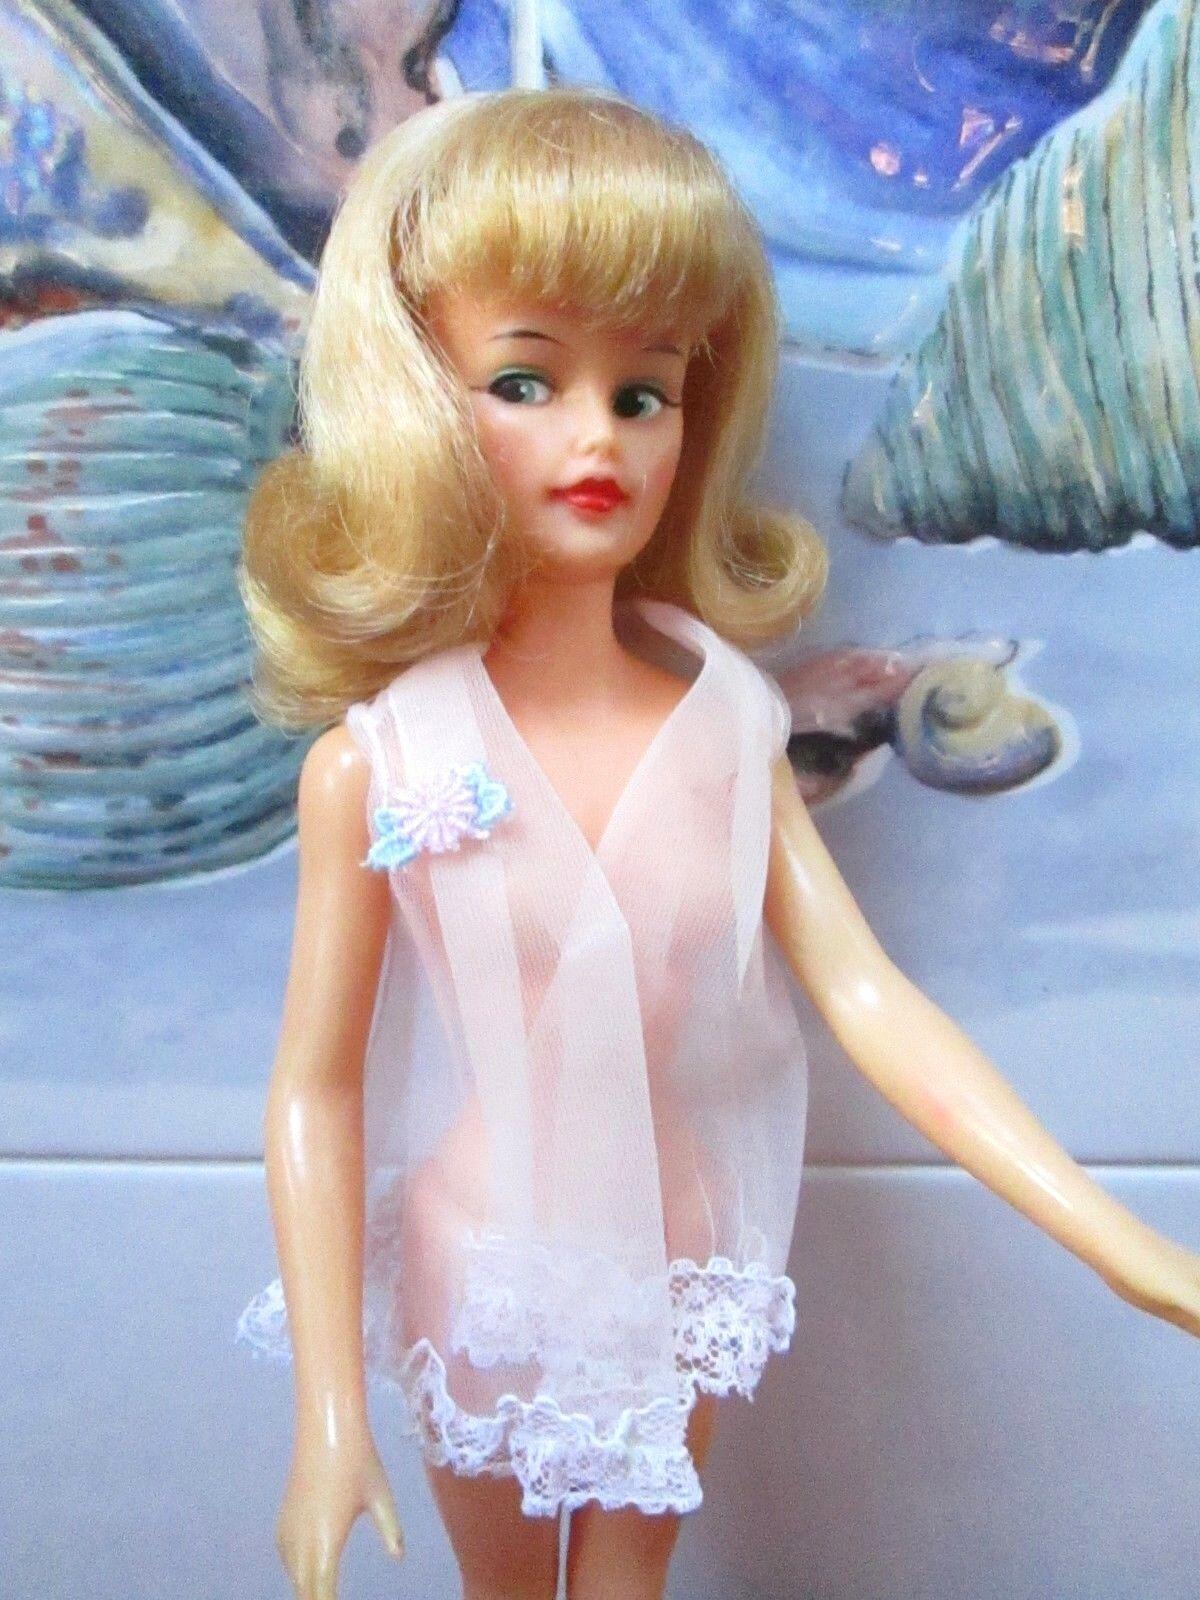 1965 Ideal  Miss Clairol  Glamour Misty  como nuevo rostro + larga rubia Flip  Original Traje